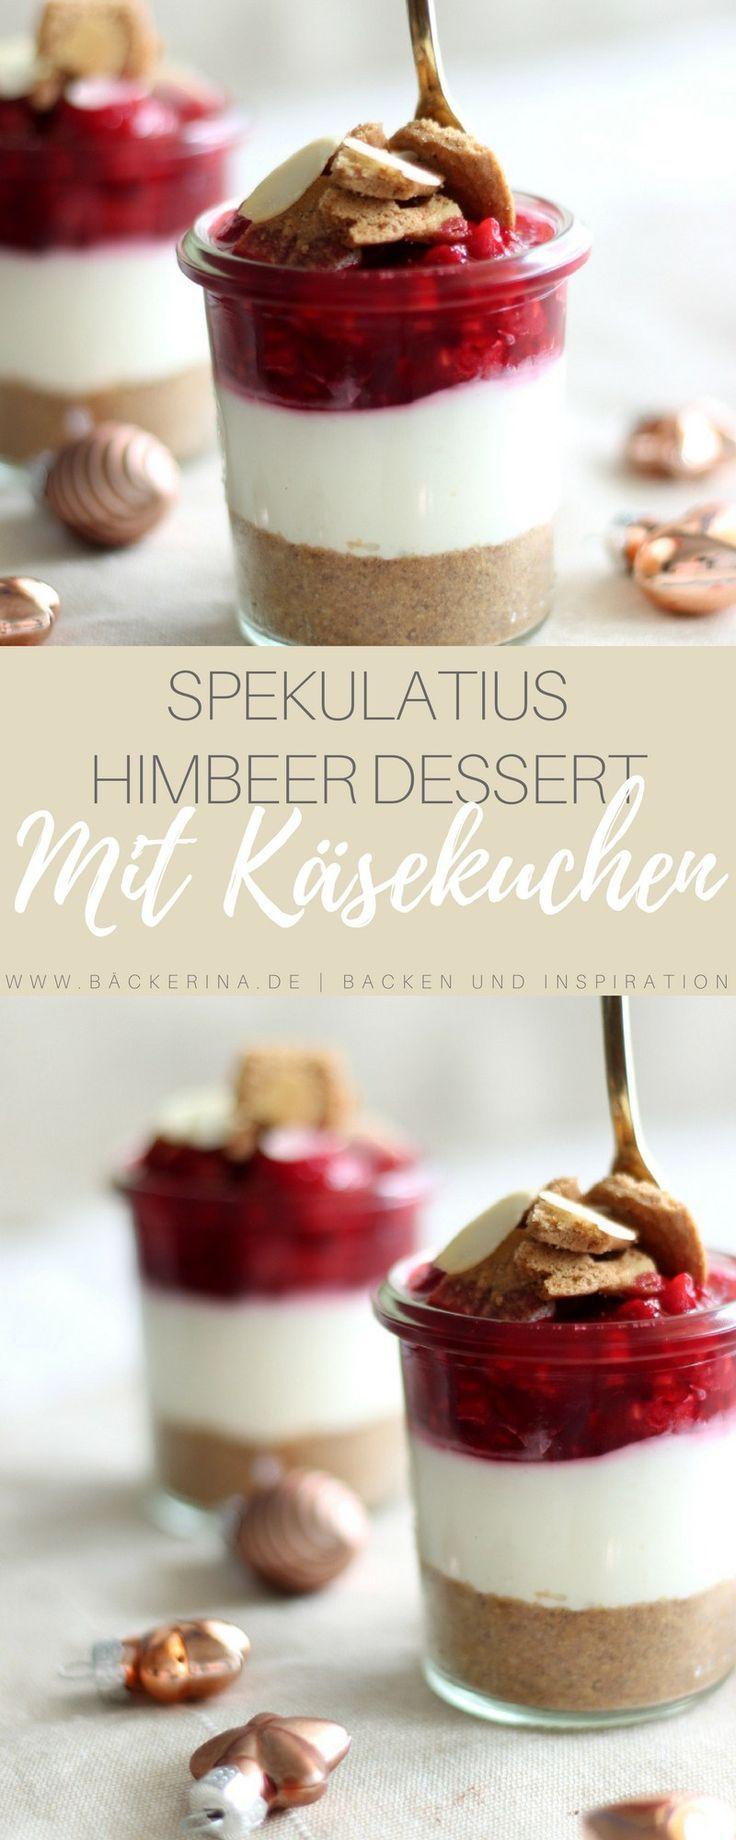 No bake Cheesecake im Glas – leckeres Spekulatius Himbeer Dessert